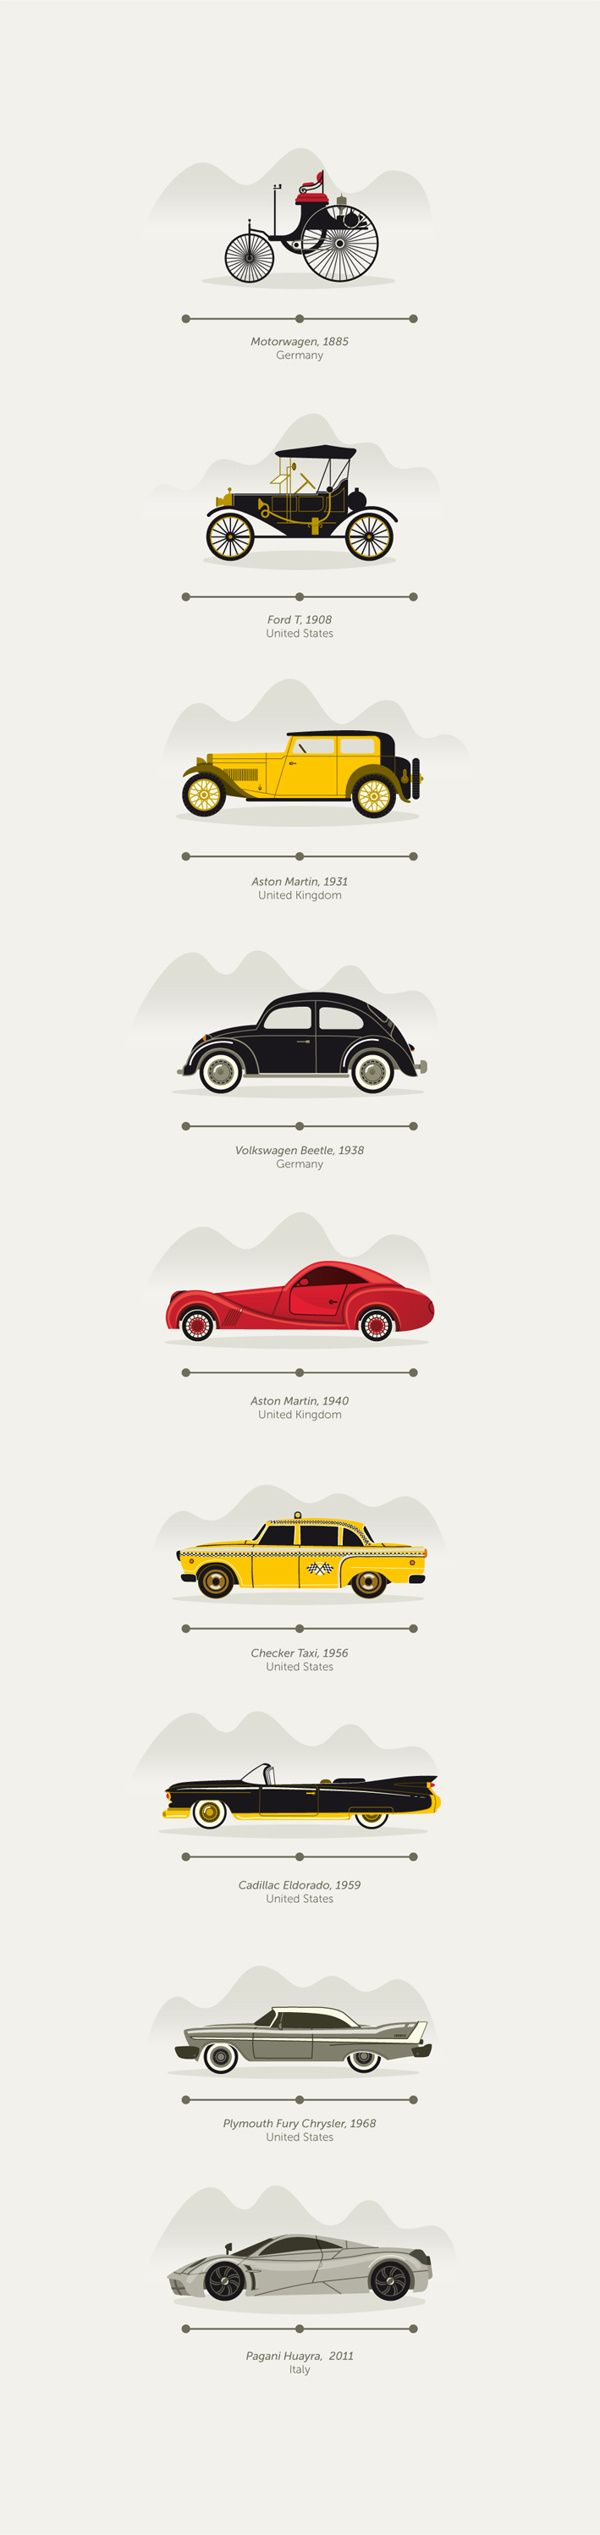 #flat material##car#